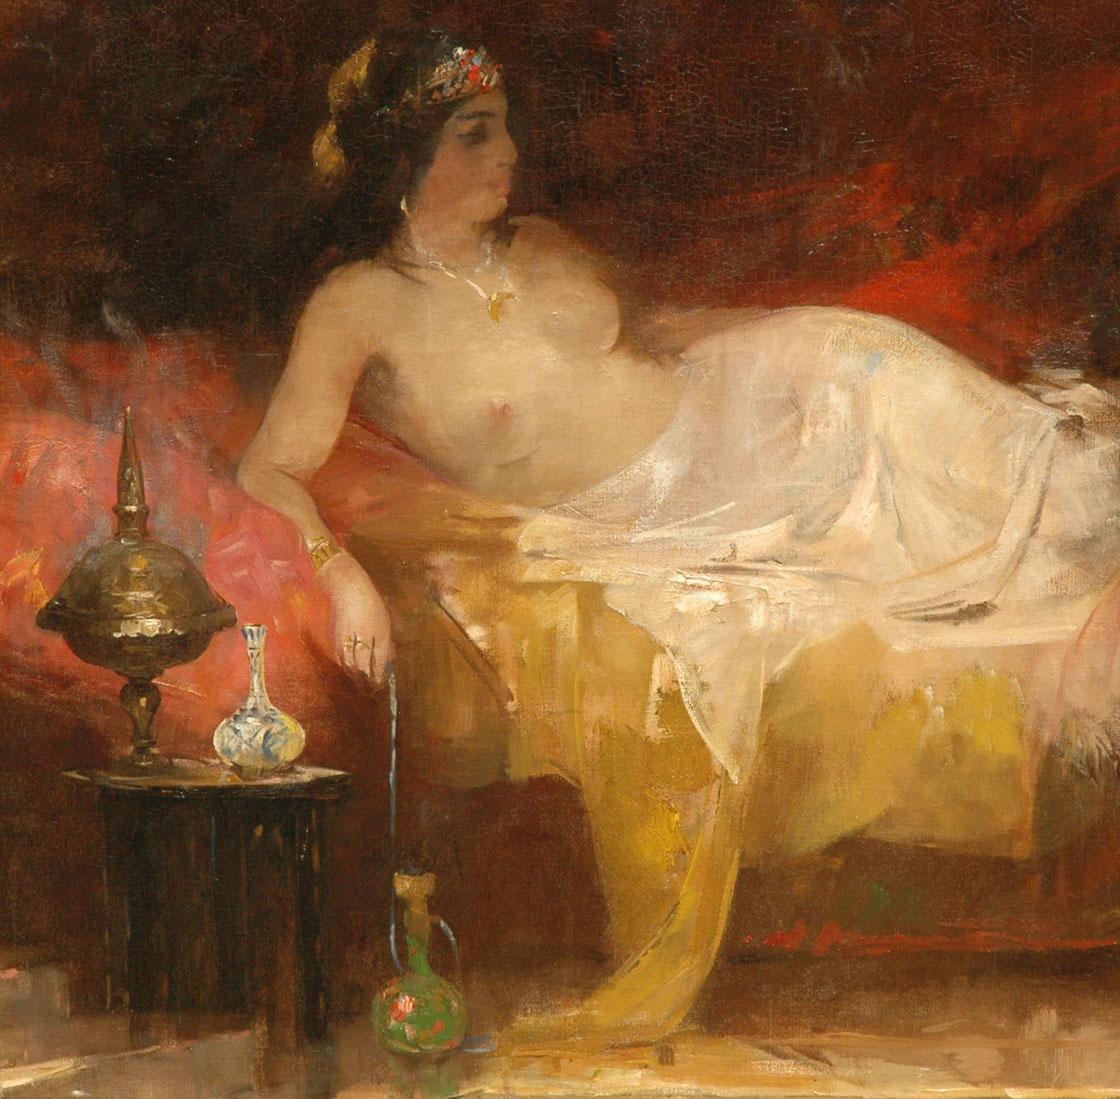 Smith H. - Odalisk, olieverf op doek 100,4 x 100 cm